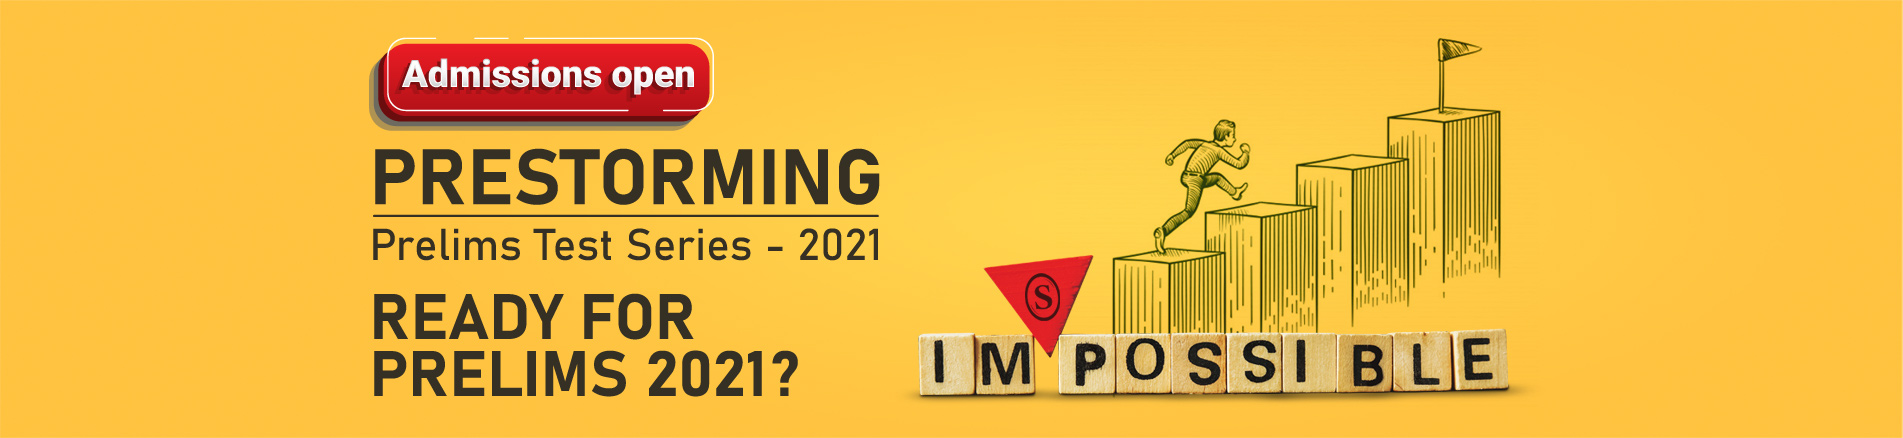 Prestorming 2021